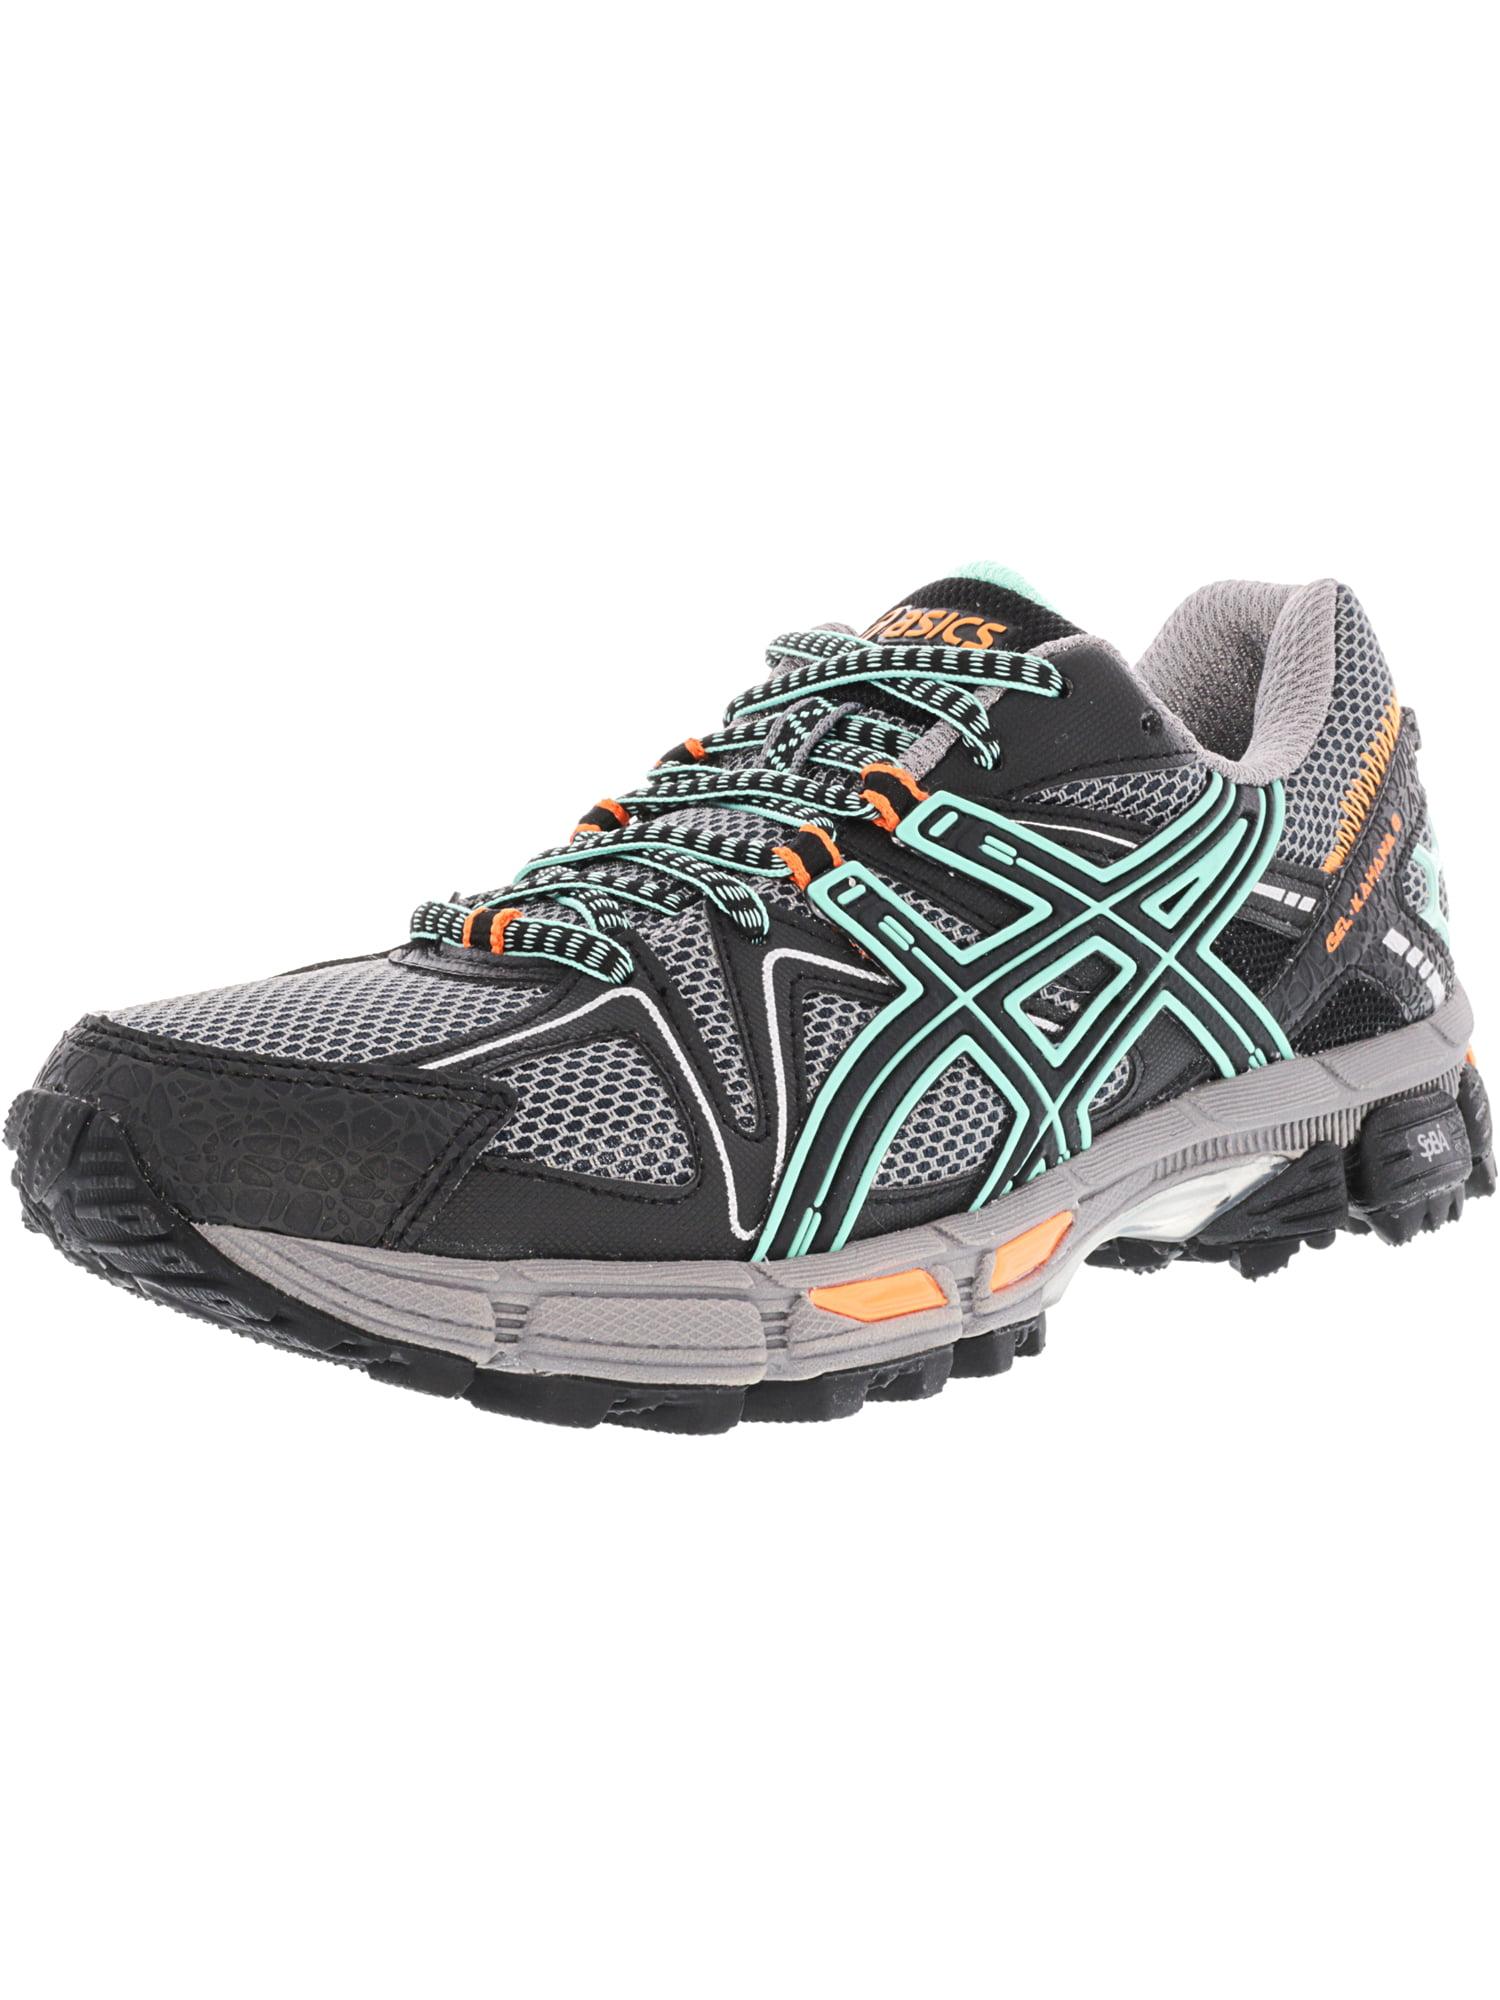 Women's GEL-Kahana 8 Trail Running Shoe